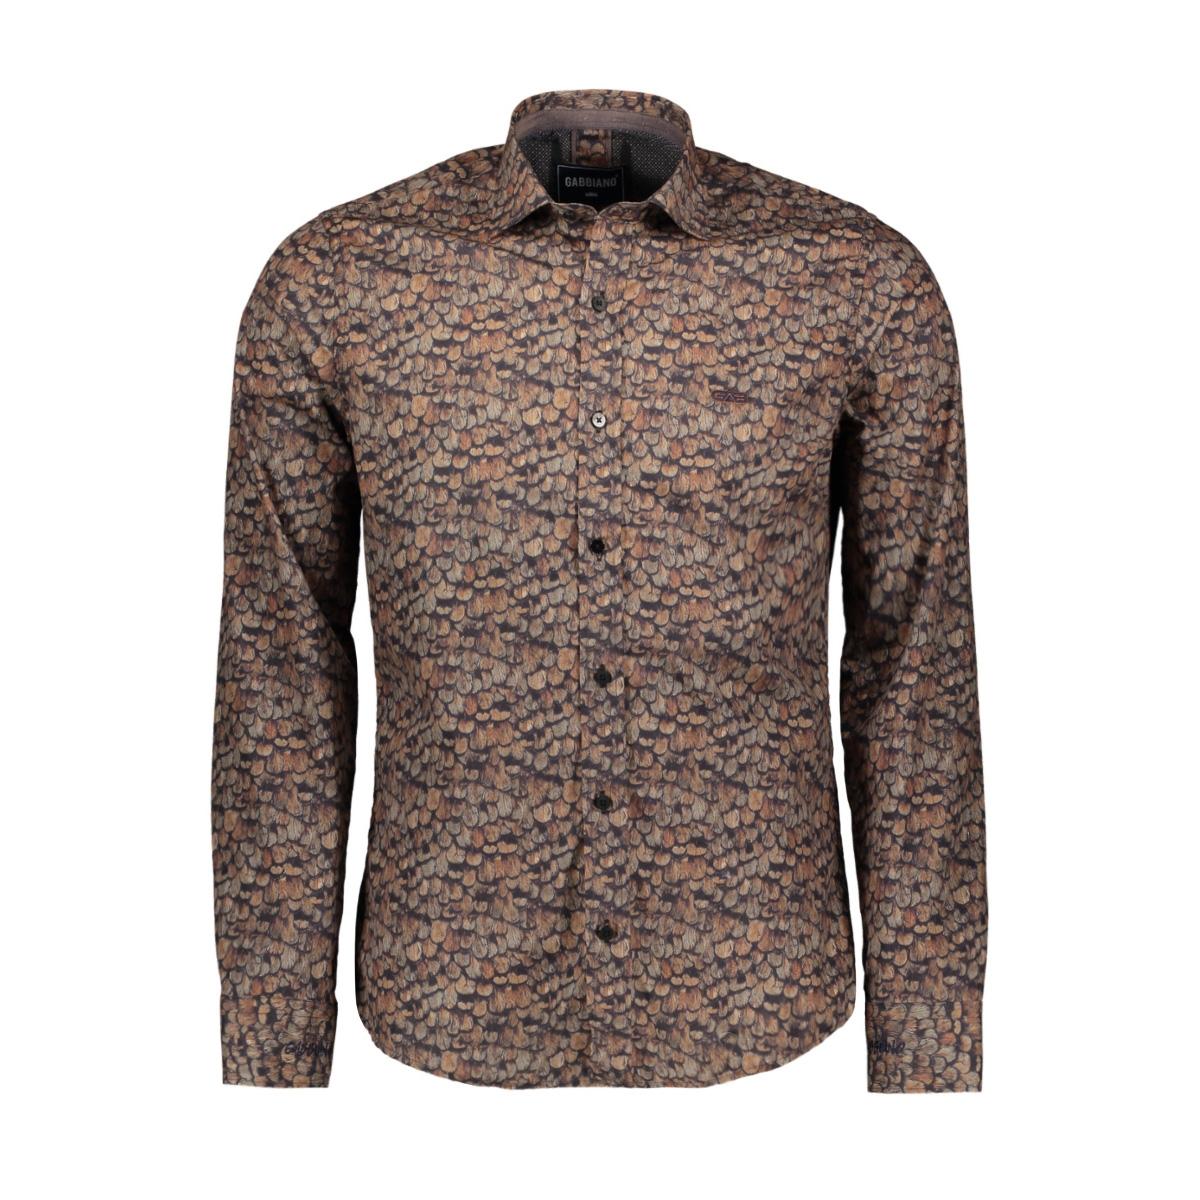 32661 gabbiano overhemd d10